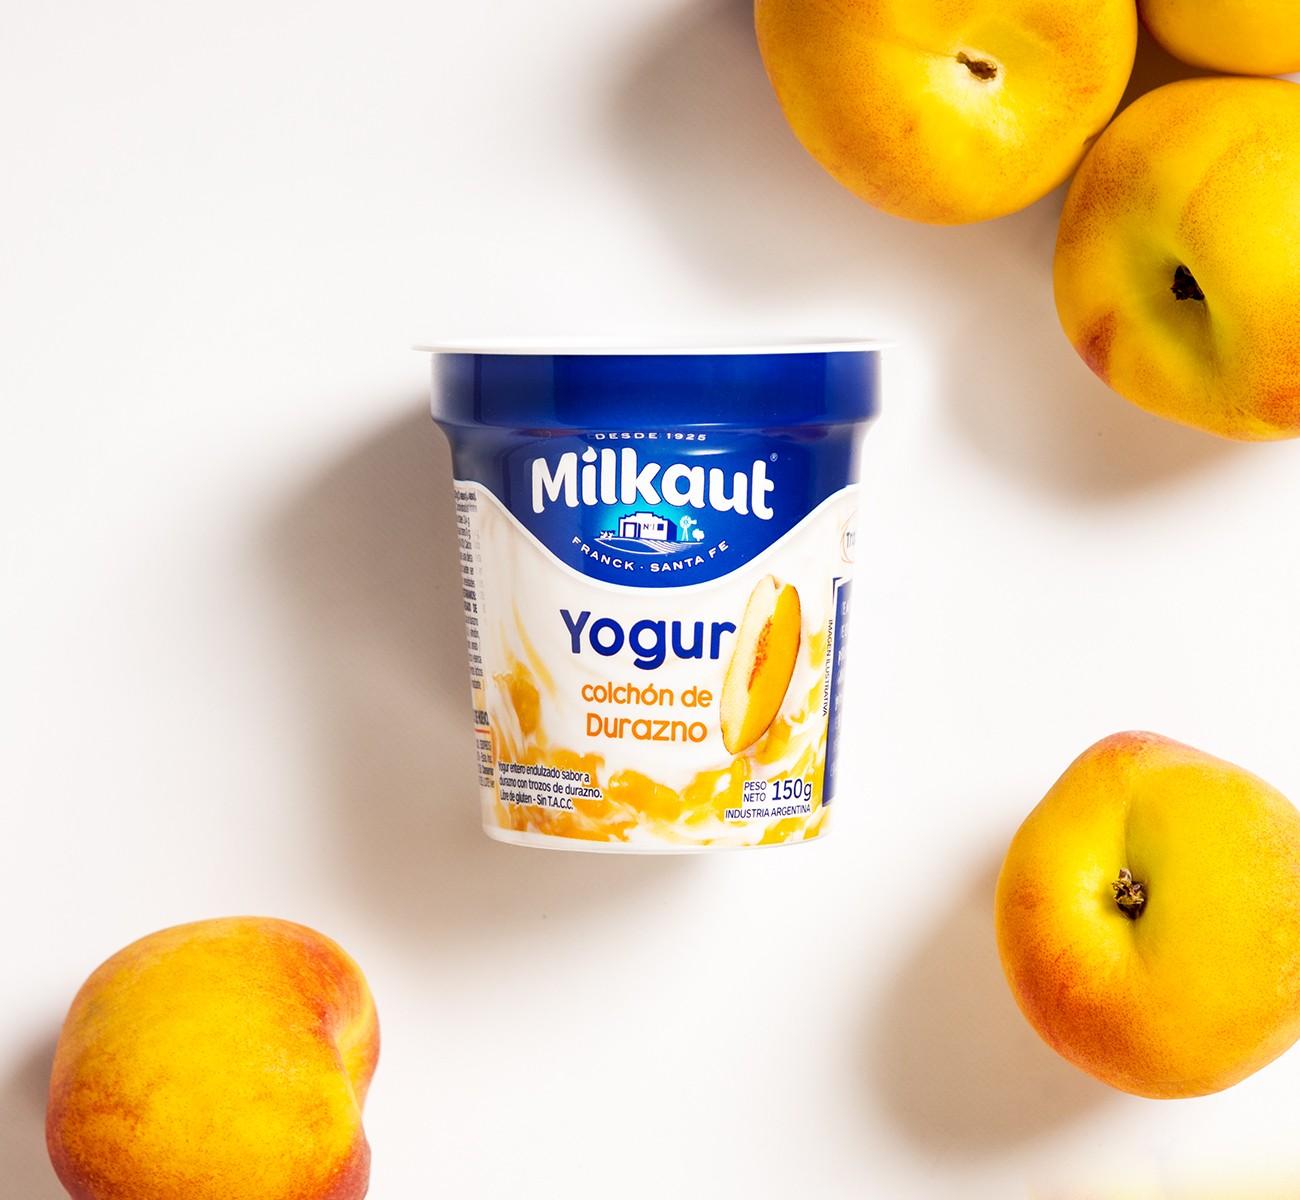 Milkaut酸奶包装快3彩票官网